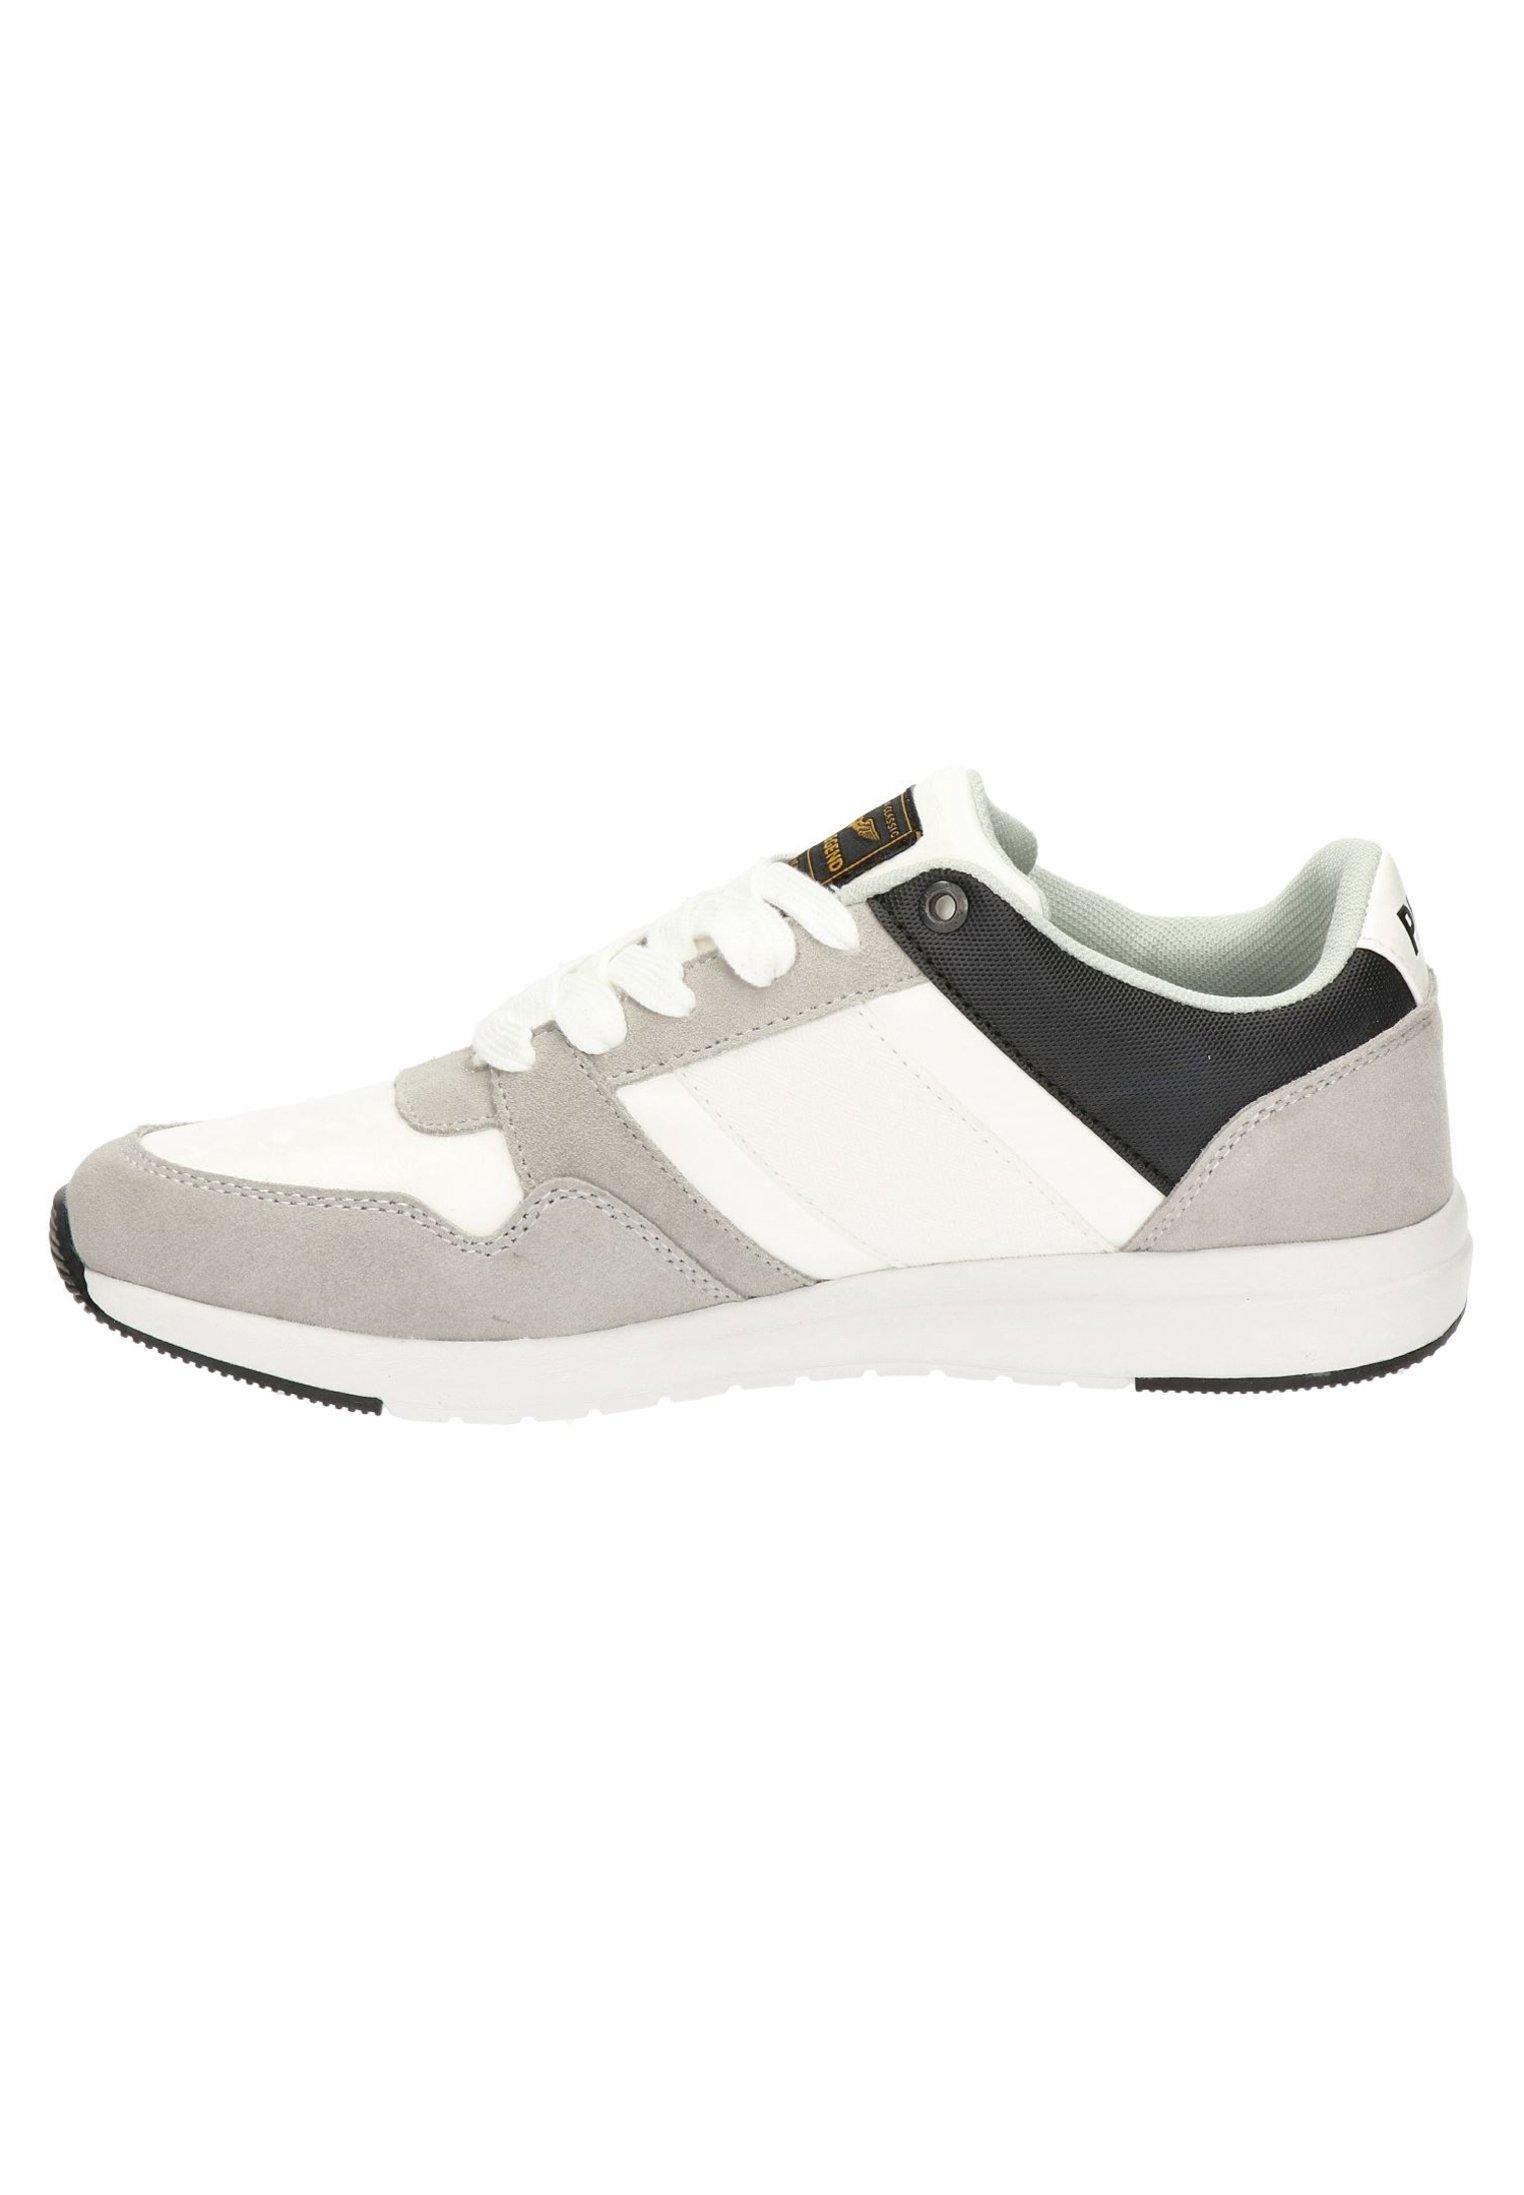 PME Legend Kleding, schoenen, sport & accessoires online